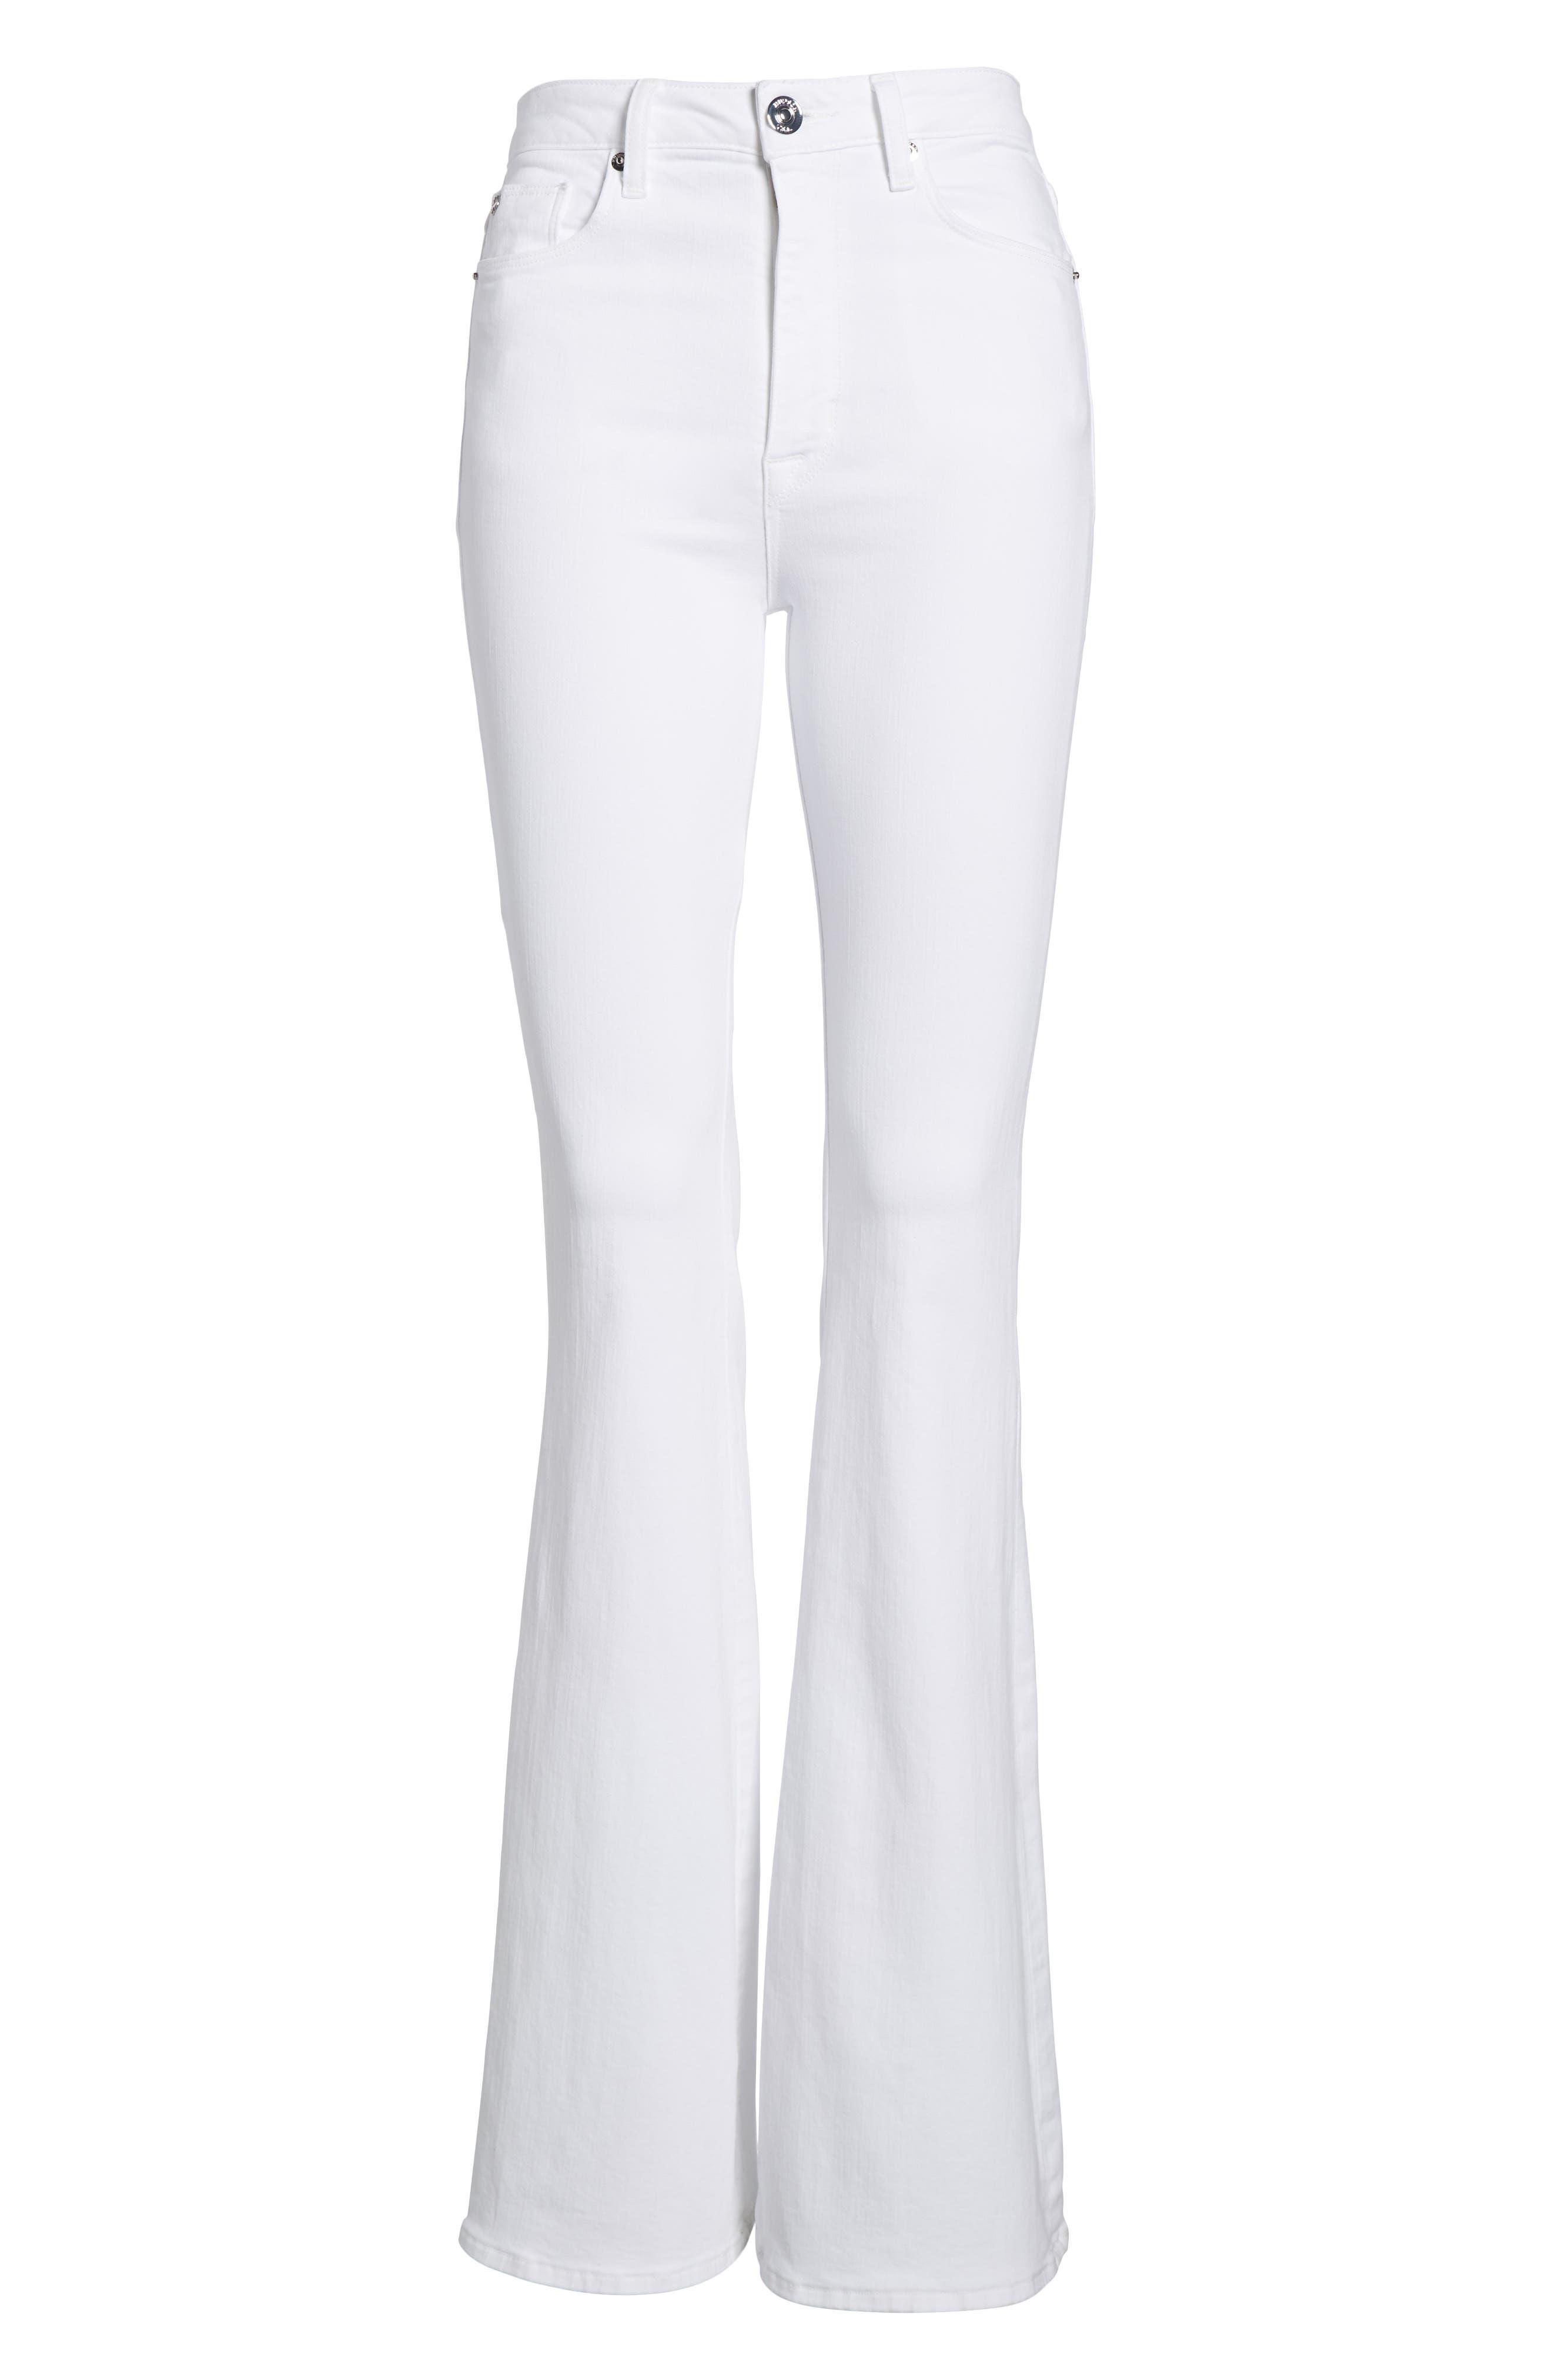 Holly High Waist Flare Jeans,                             Alternate thumbnail 7, color,                             110